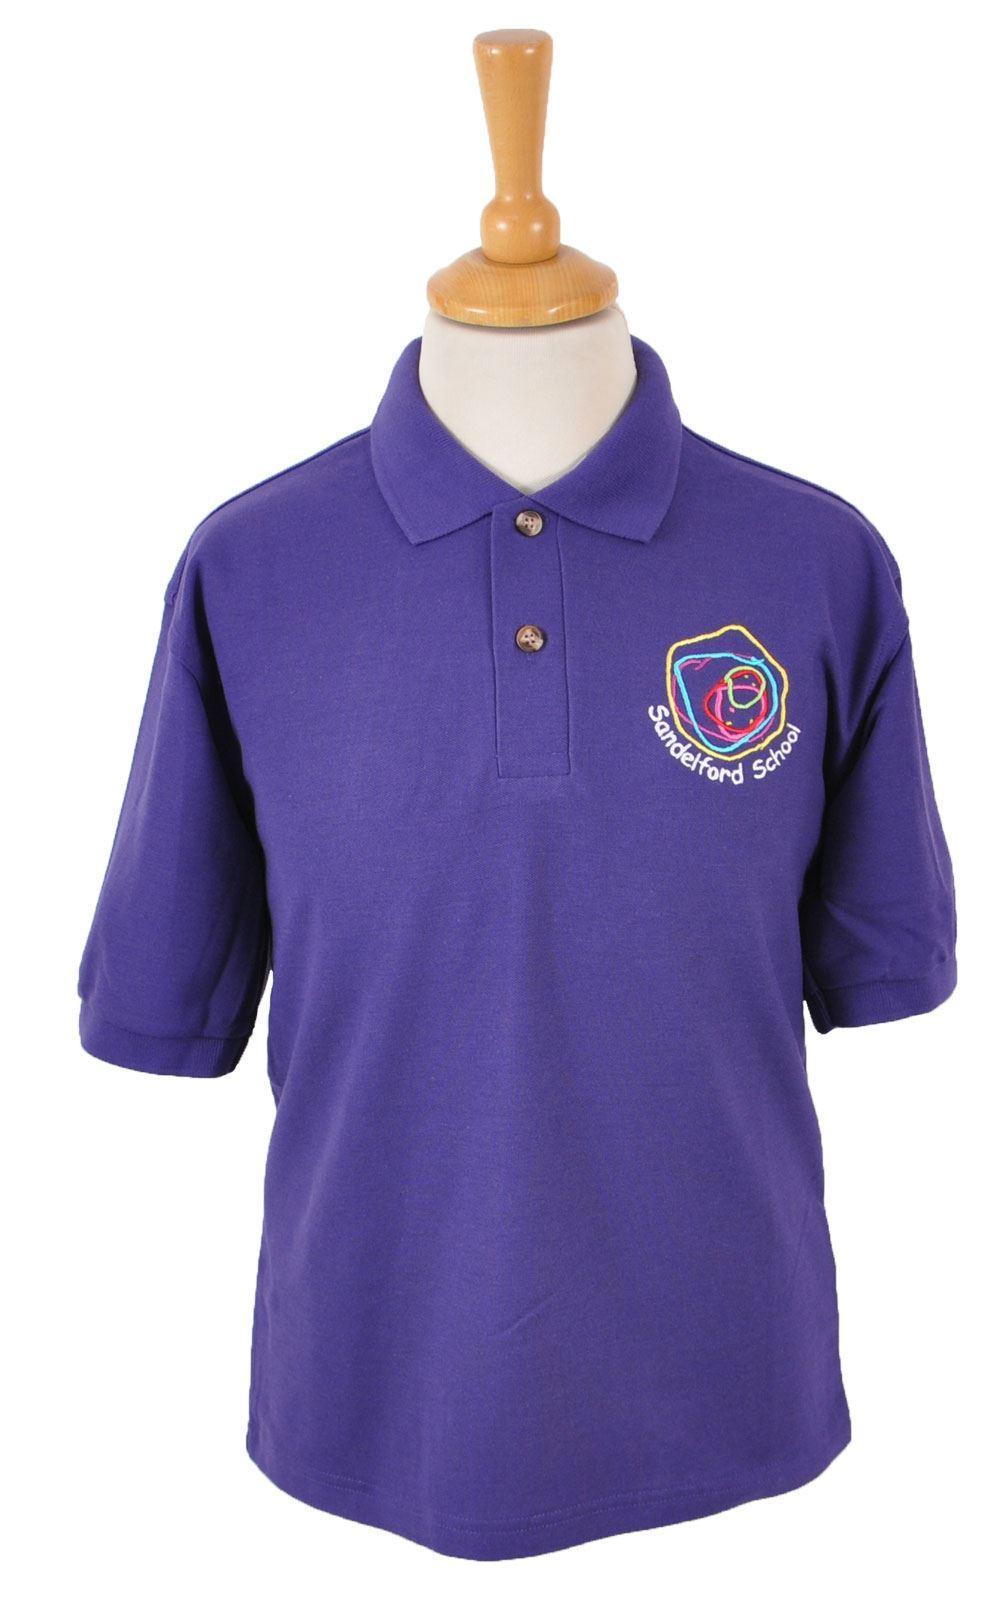 St Moore Sandelford School Purple Polo Blue Max